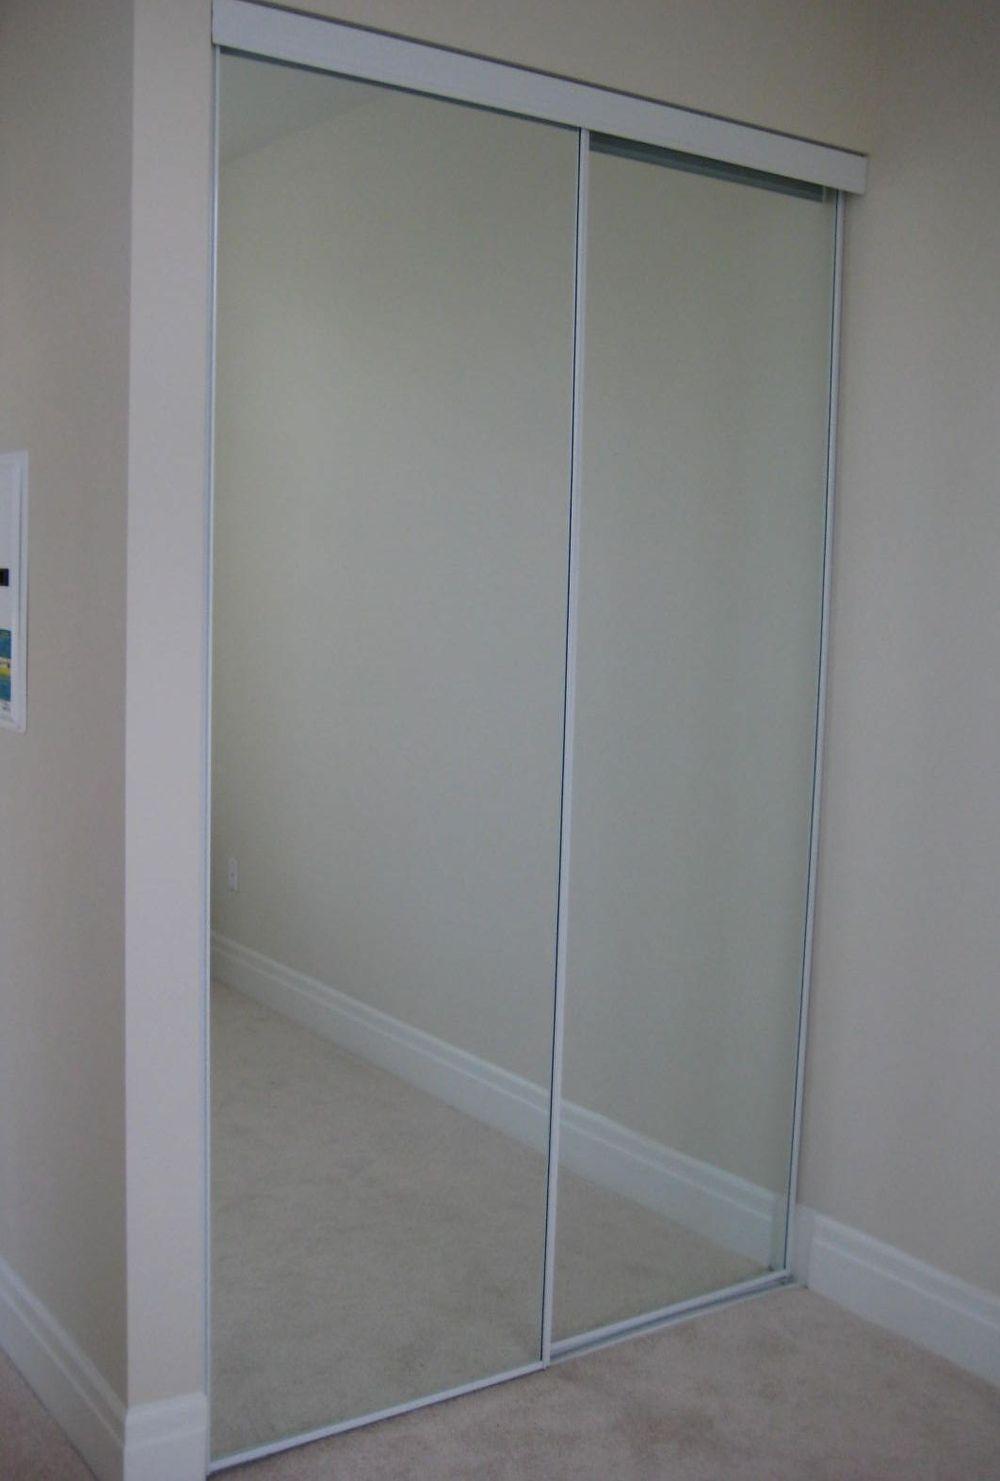 Mirror Sliding Doors, ScarboroughMarkham, Newmarket, Richmond Hill